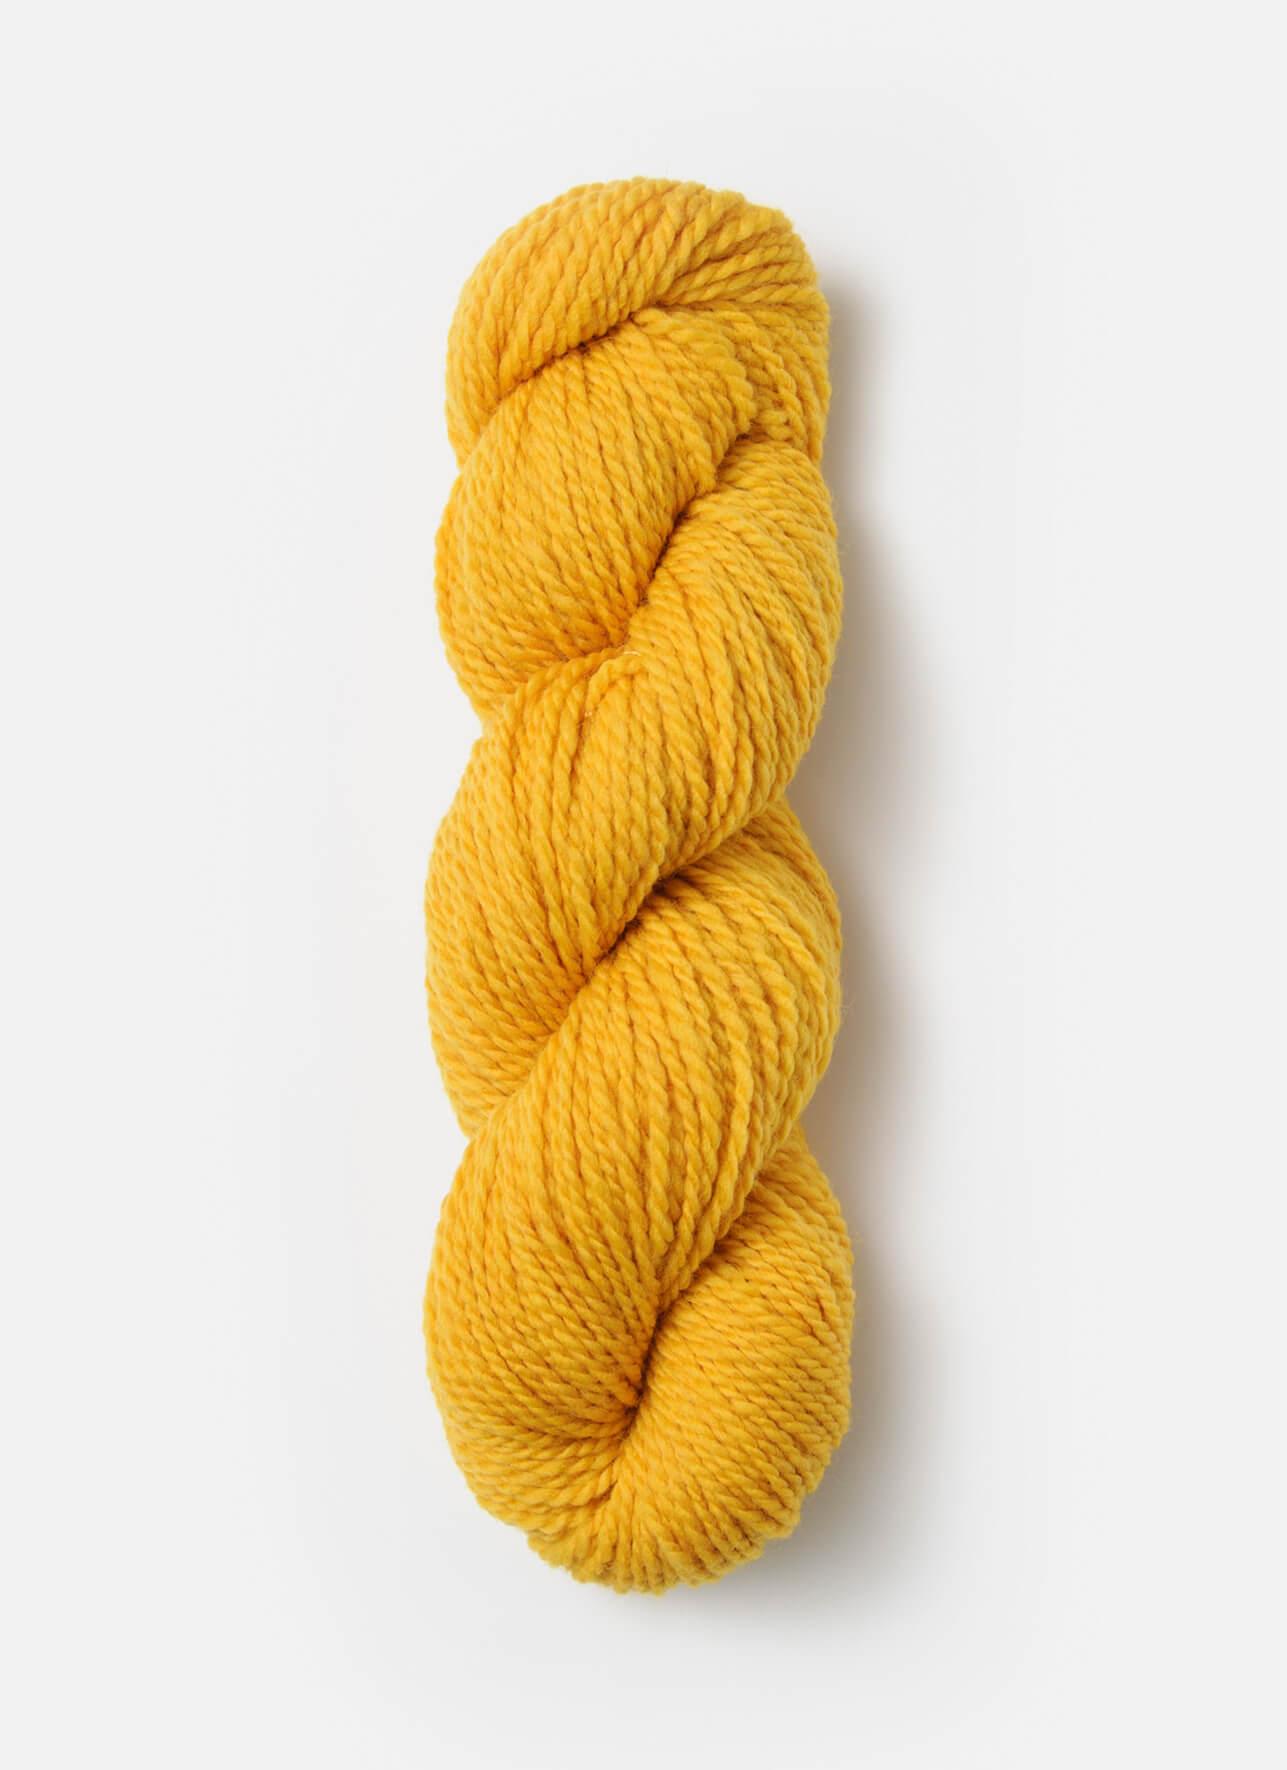 No. 1316: Spun Gold